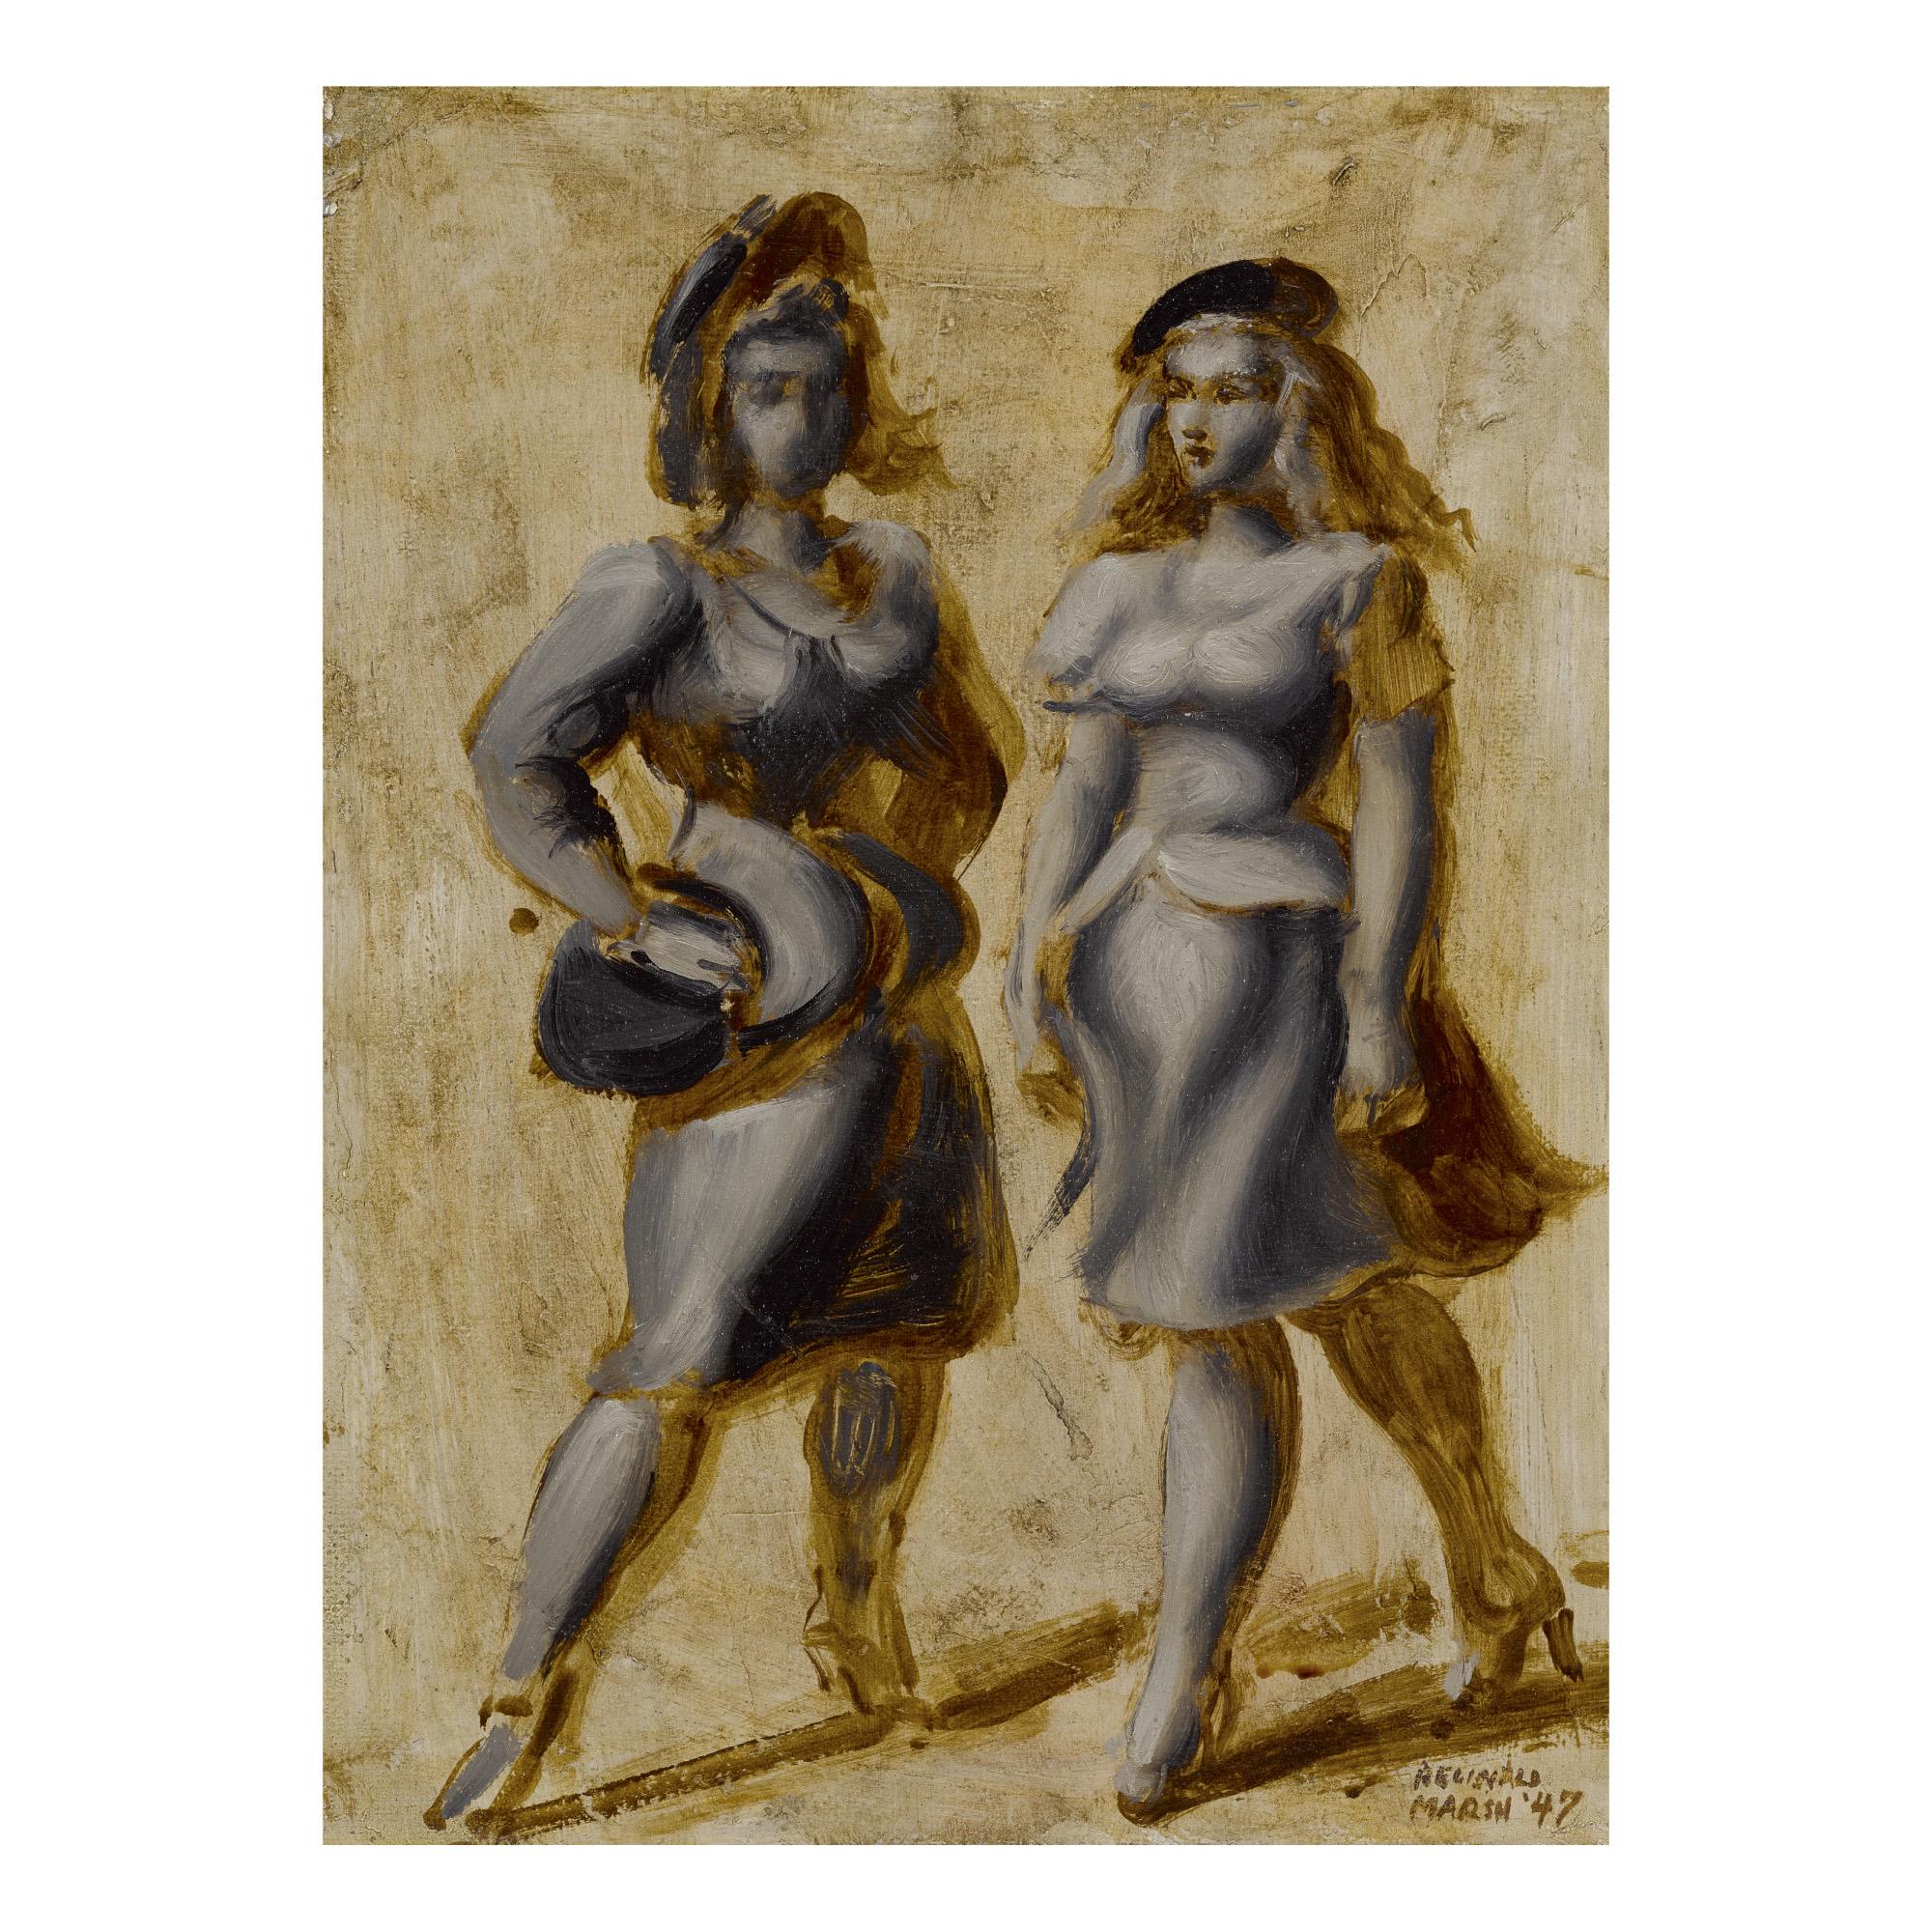 REGINALD MARSH | TWO WOMEN (STREET WALKERS)